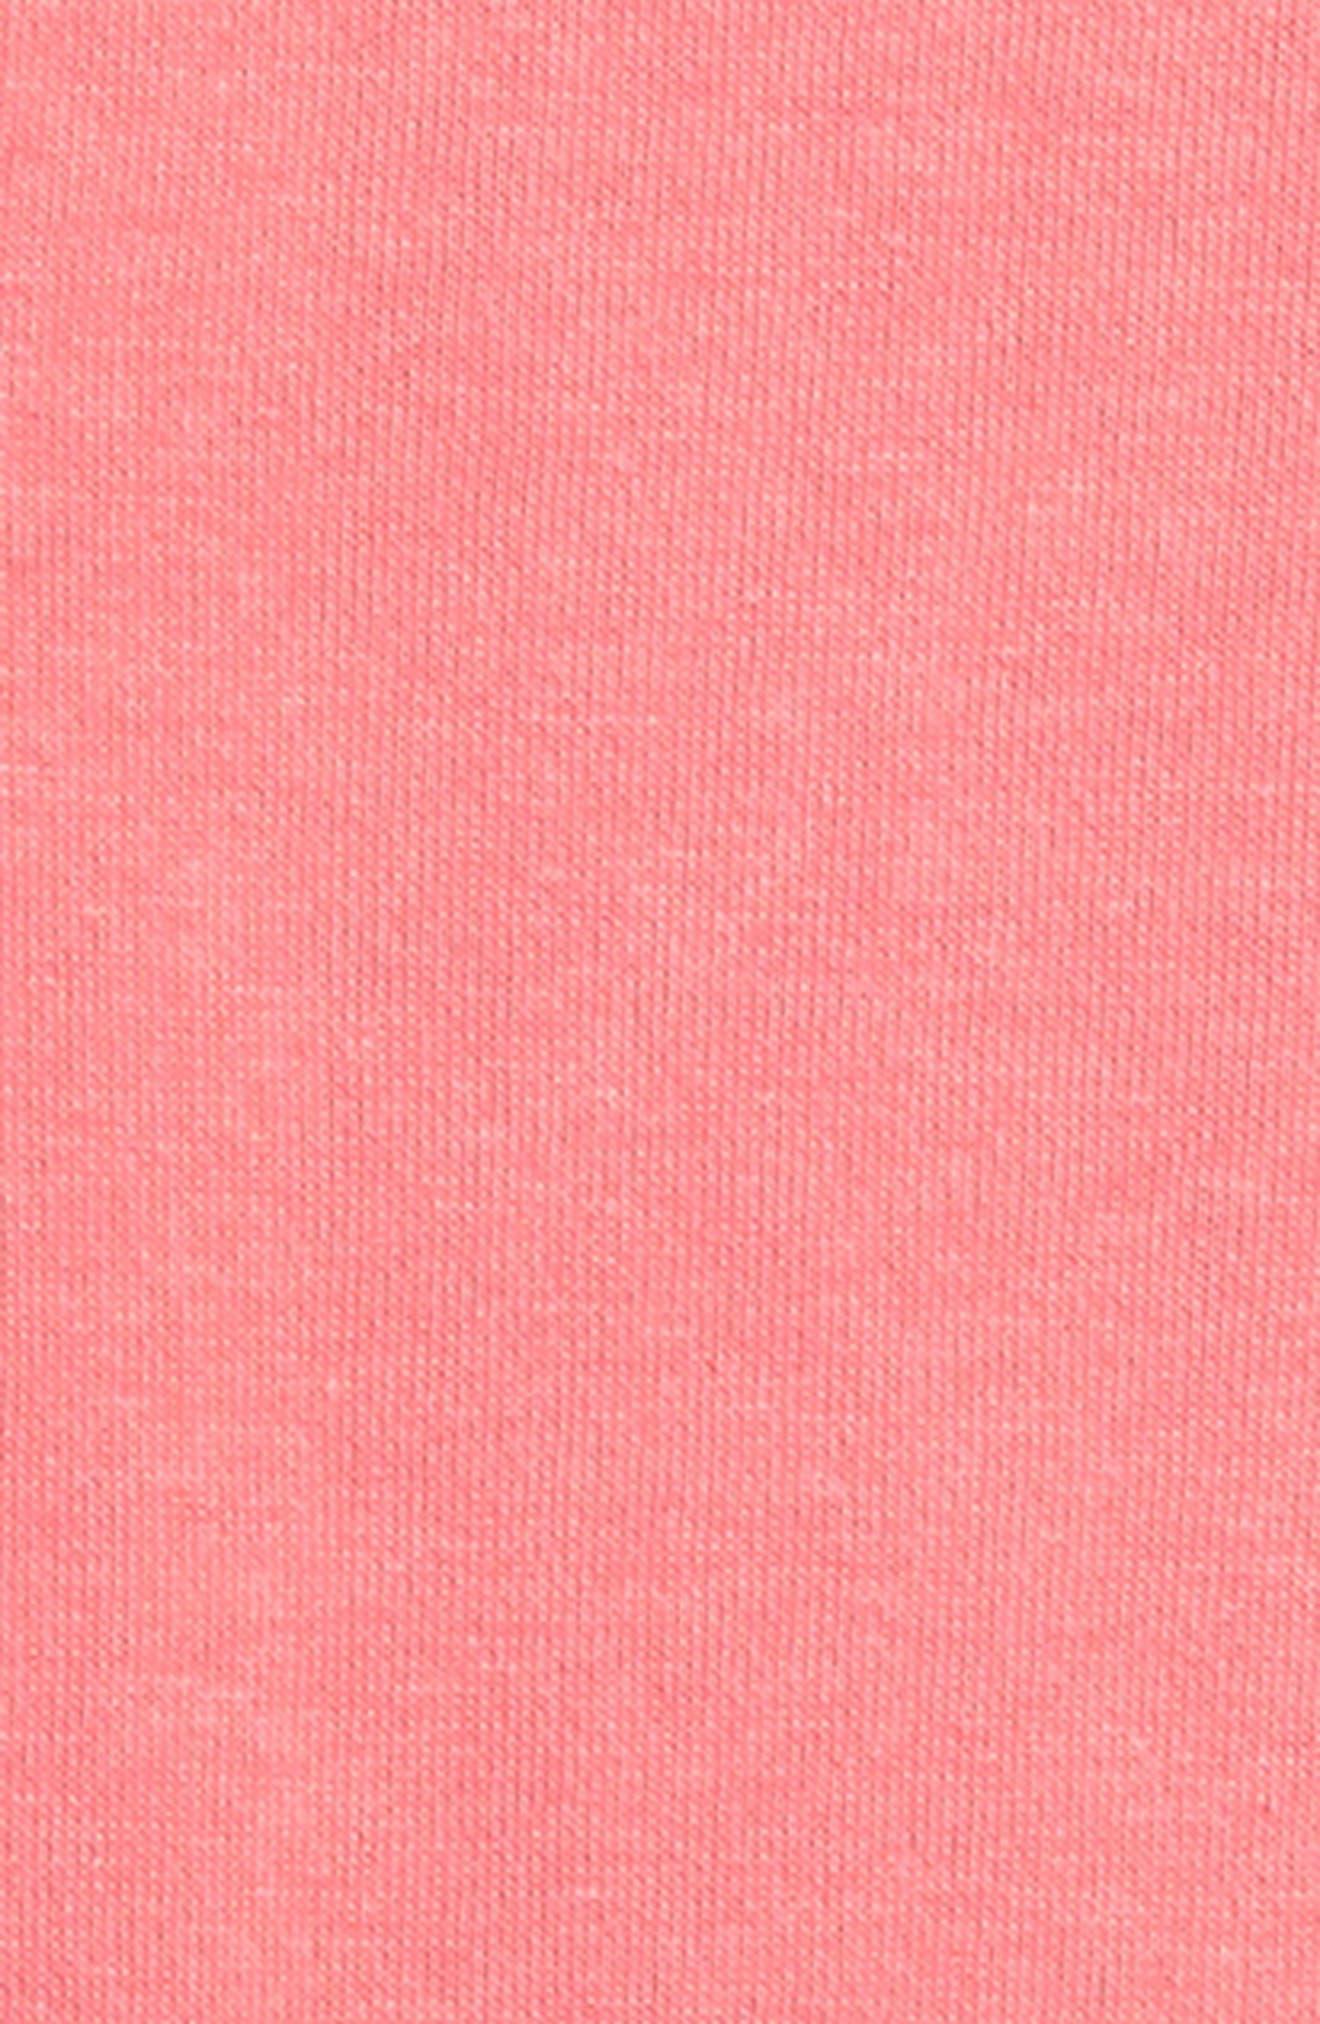 Alternate Image 3  - C & C California Sweatshirt Dress (Big Girls)